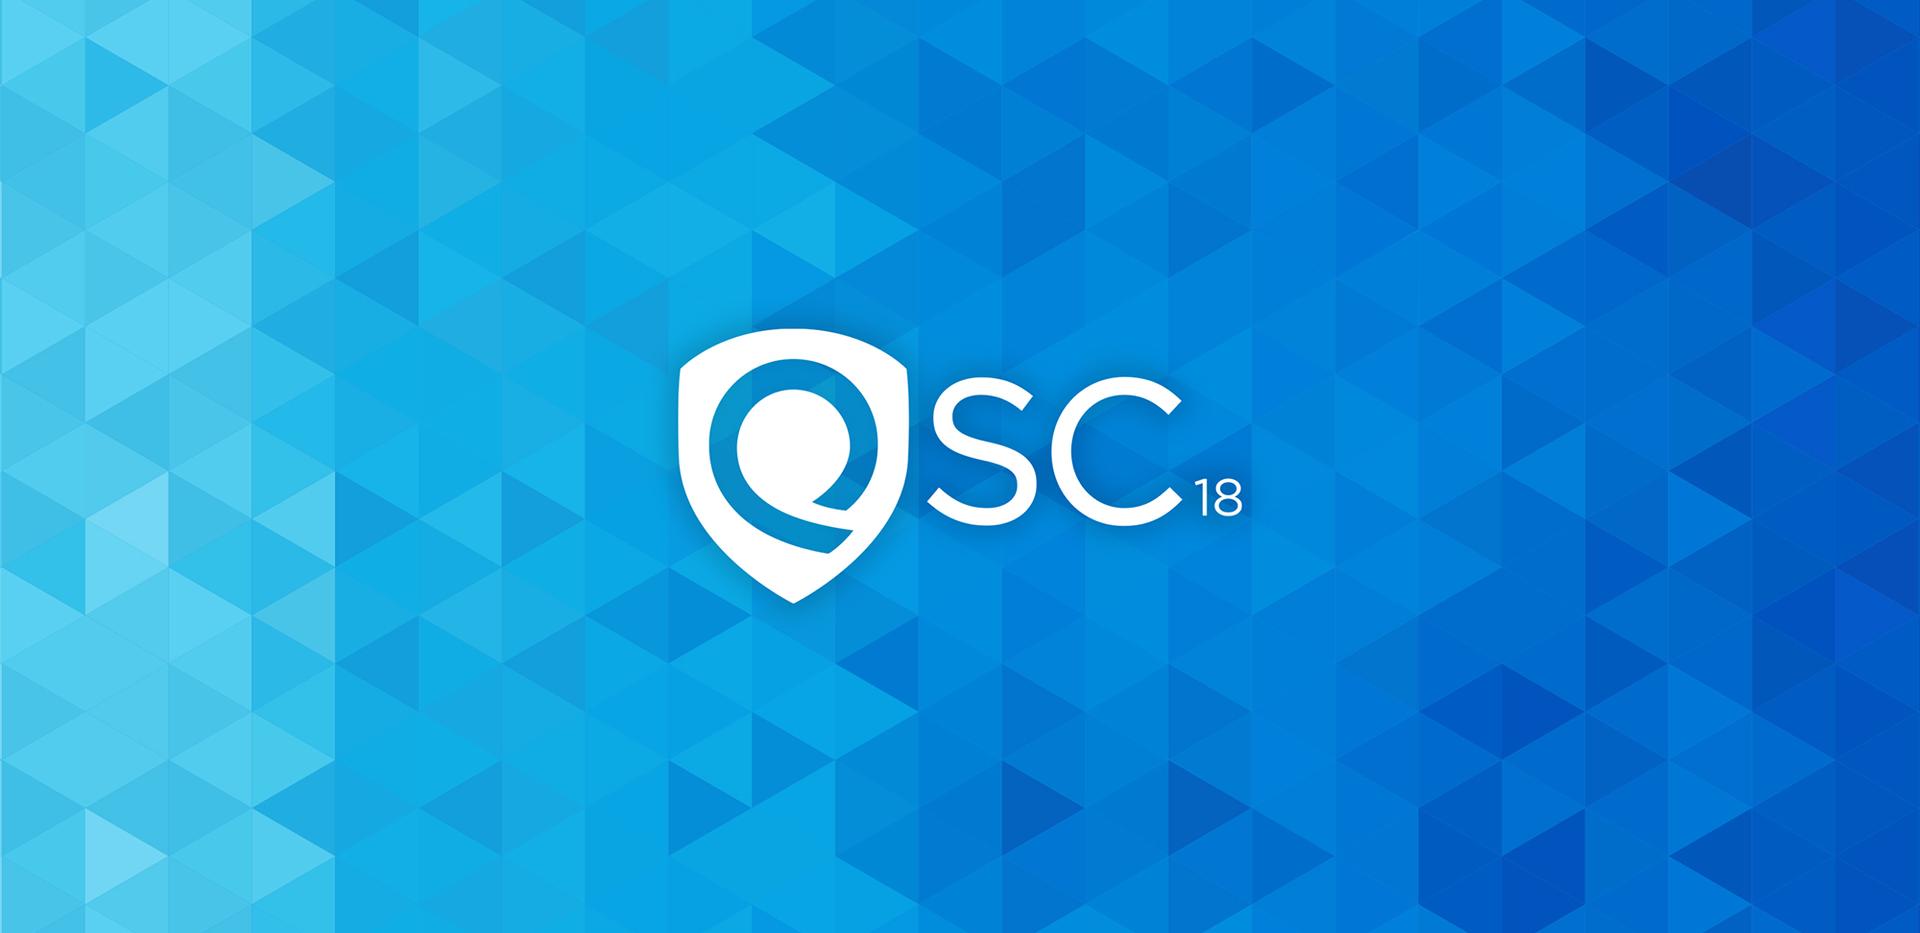 QSC 2018 main graphic